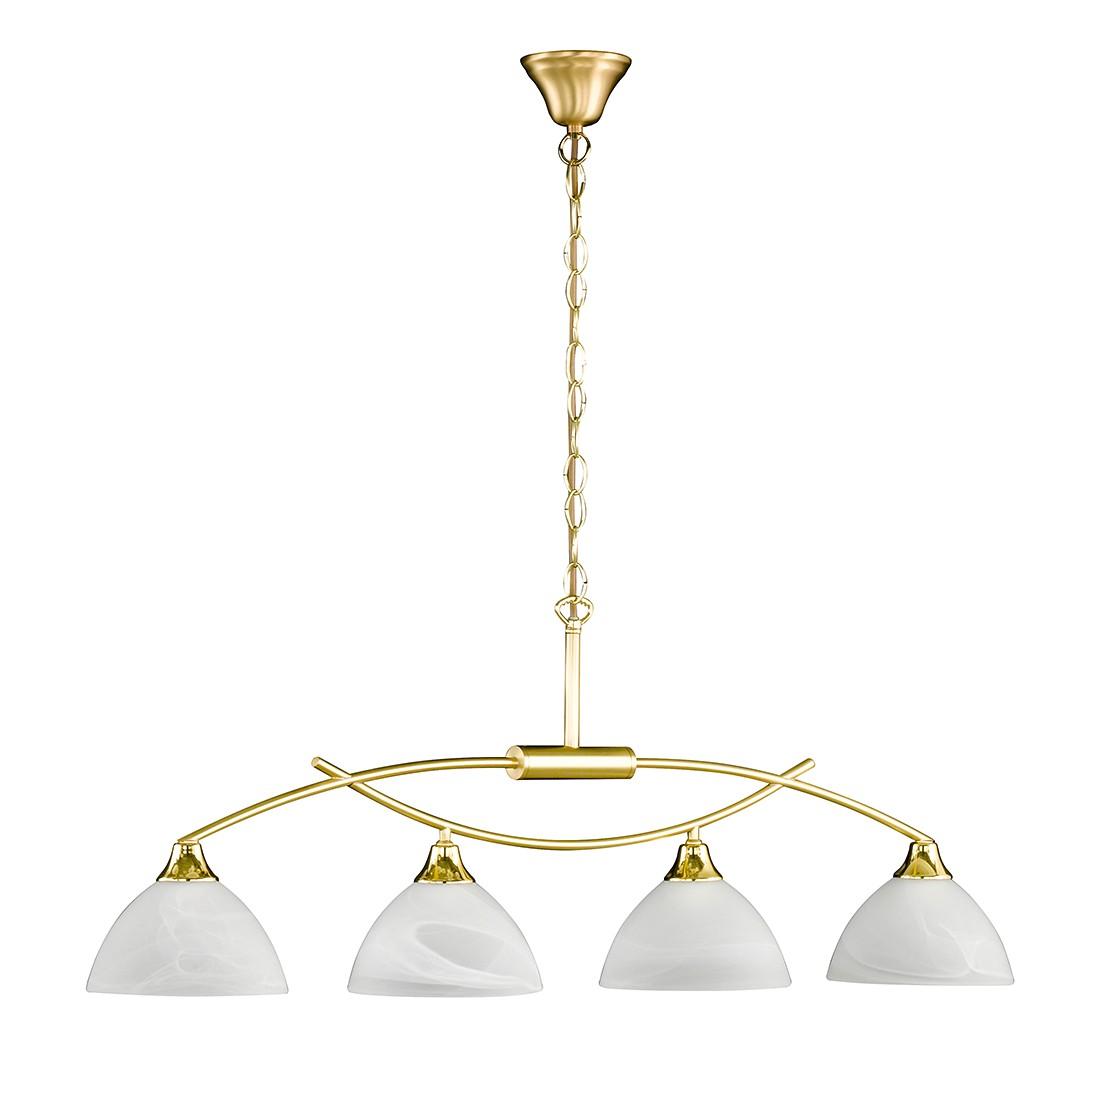 pendelleuchte renz metall gold 4 flammig honsel a jetzt. Black Bedroom Furniture Sets. Home Design Ideas